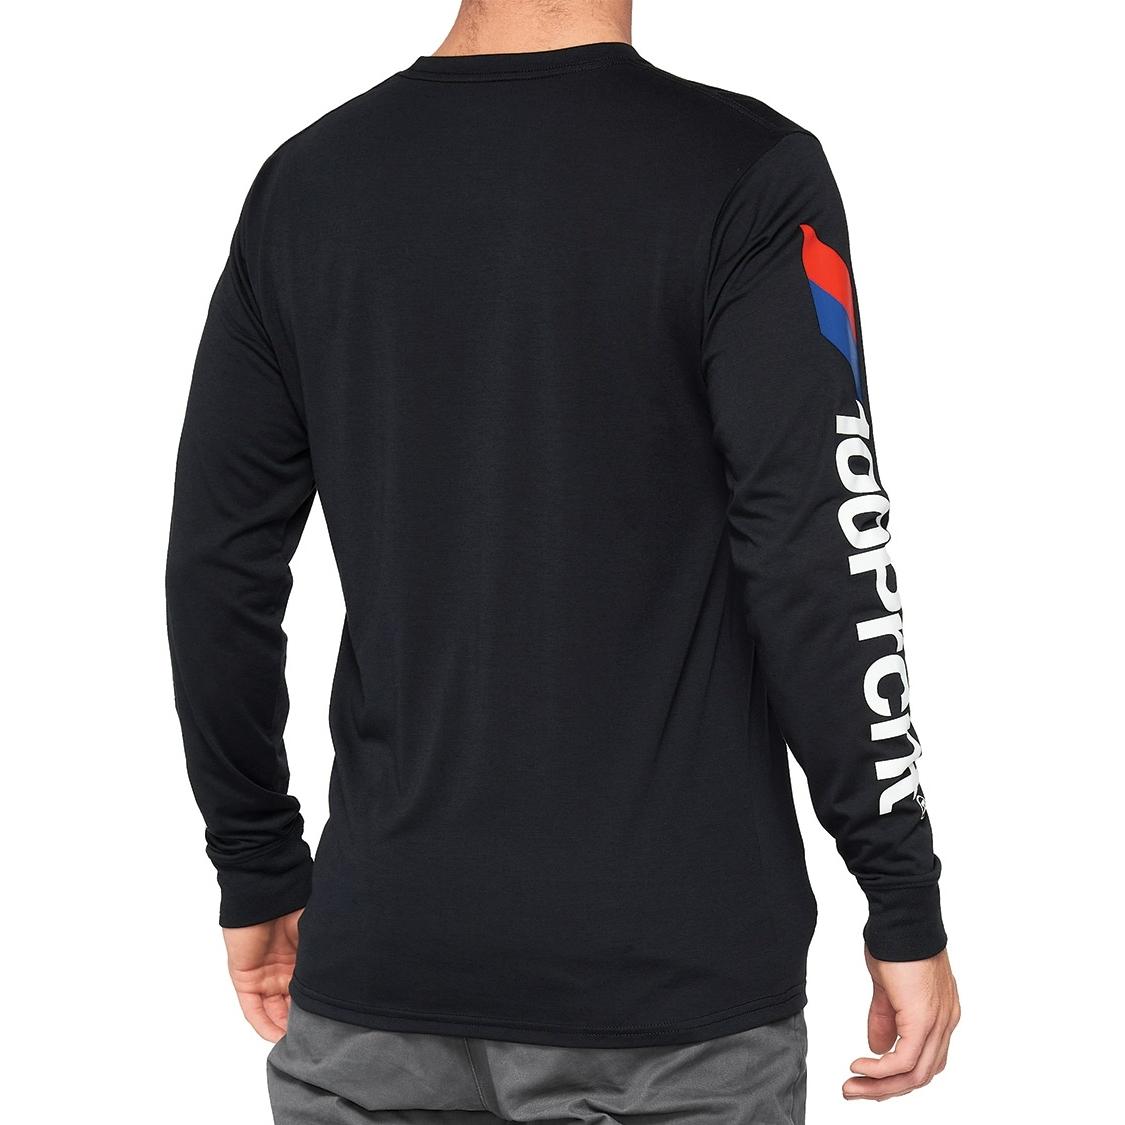 Imagen de 100% Aster Long Sleeve Tech Camisa - negro